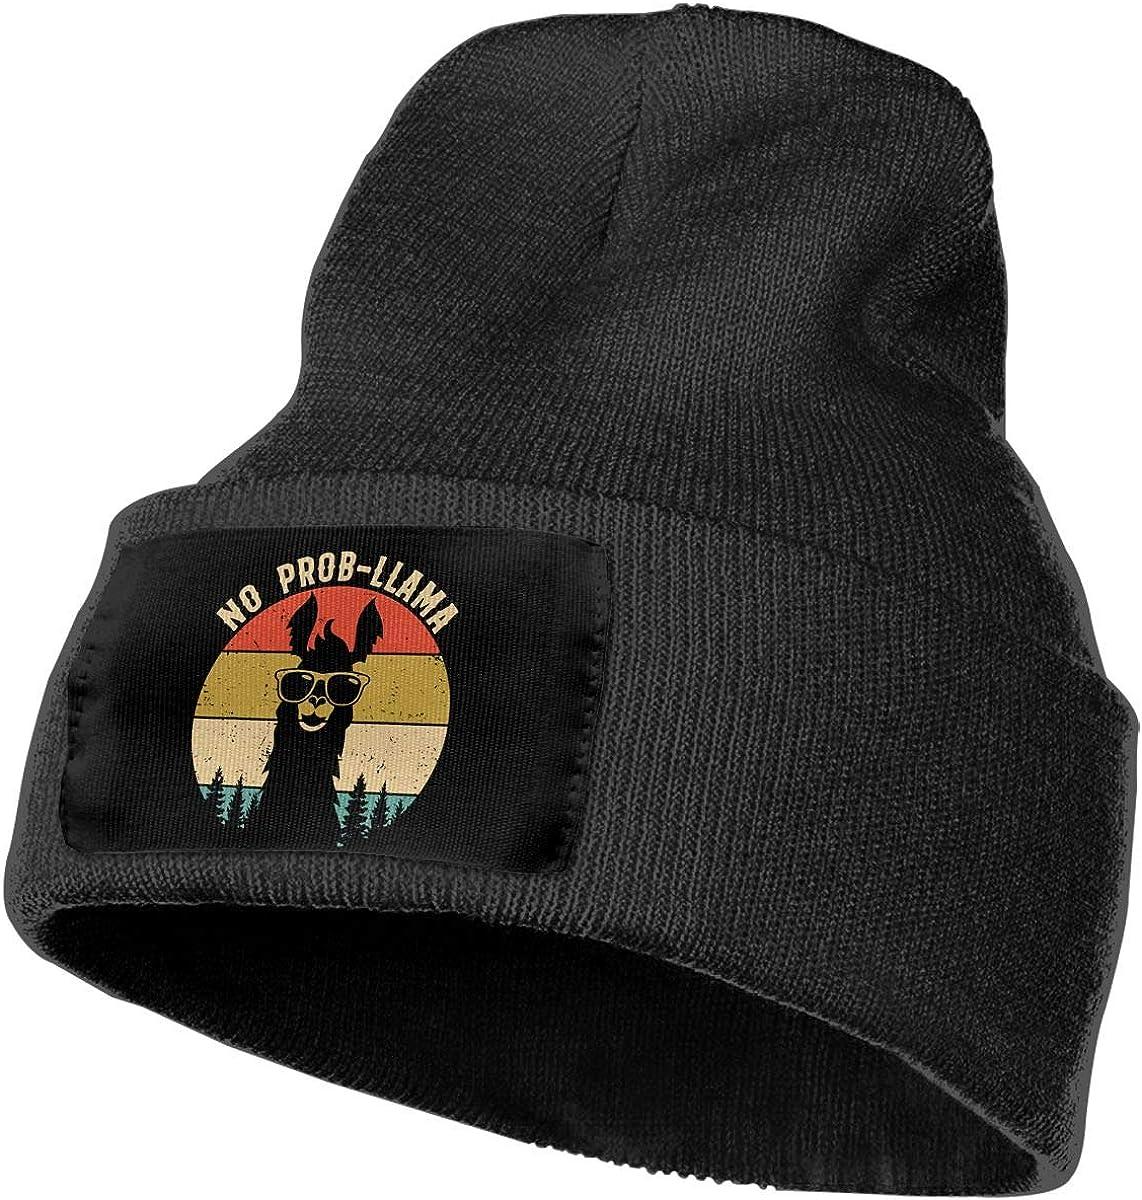 Mens/&Womens No Prob Llama Beanie Cap Thick,Soft,Warm Slouchy Knit Hat Winter Soft Ski Cap